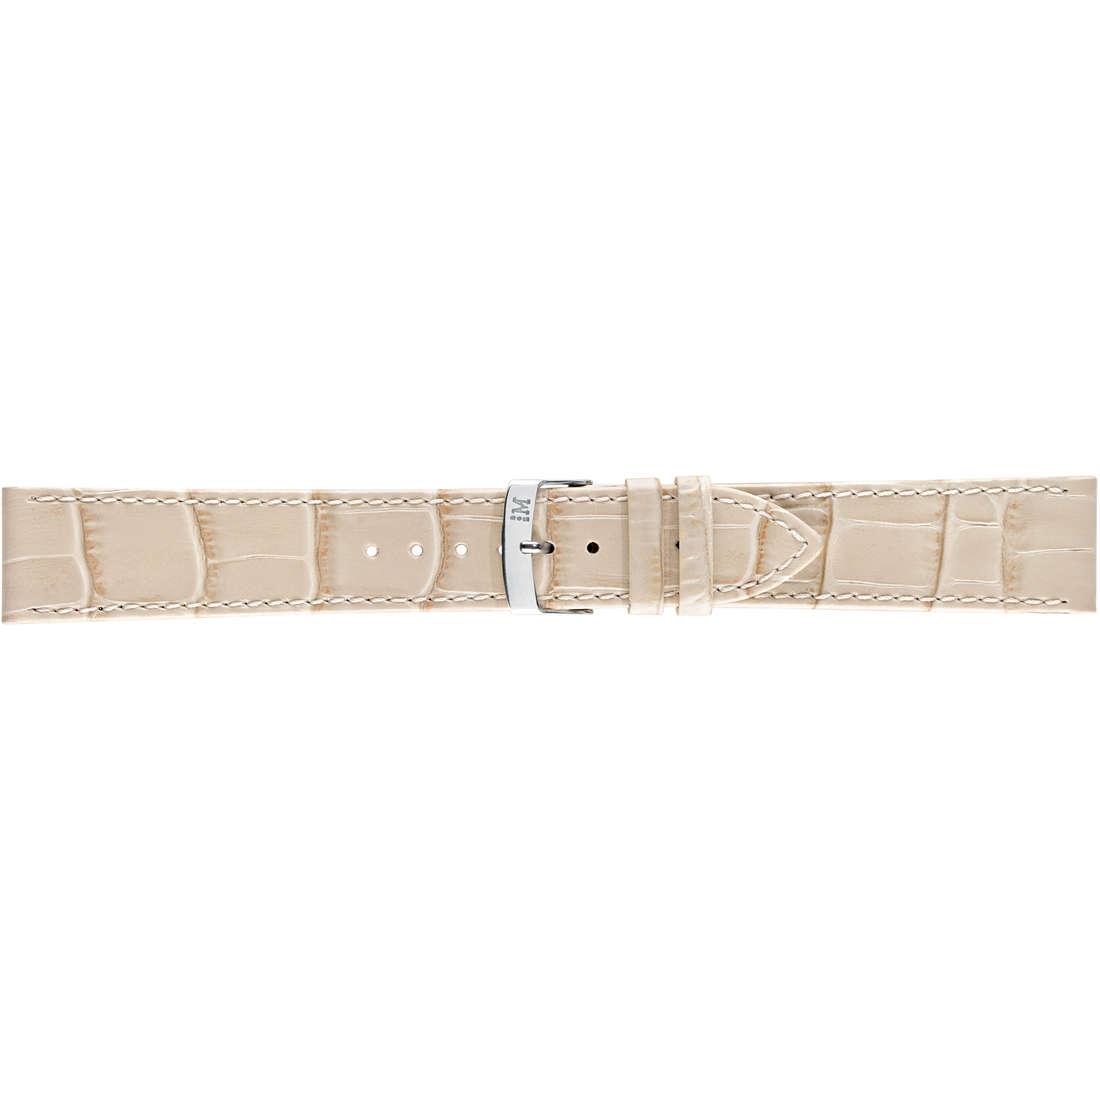 montre bande de montres homme Morellato Performance A01X2524656326CR12